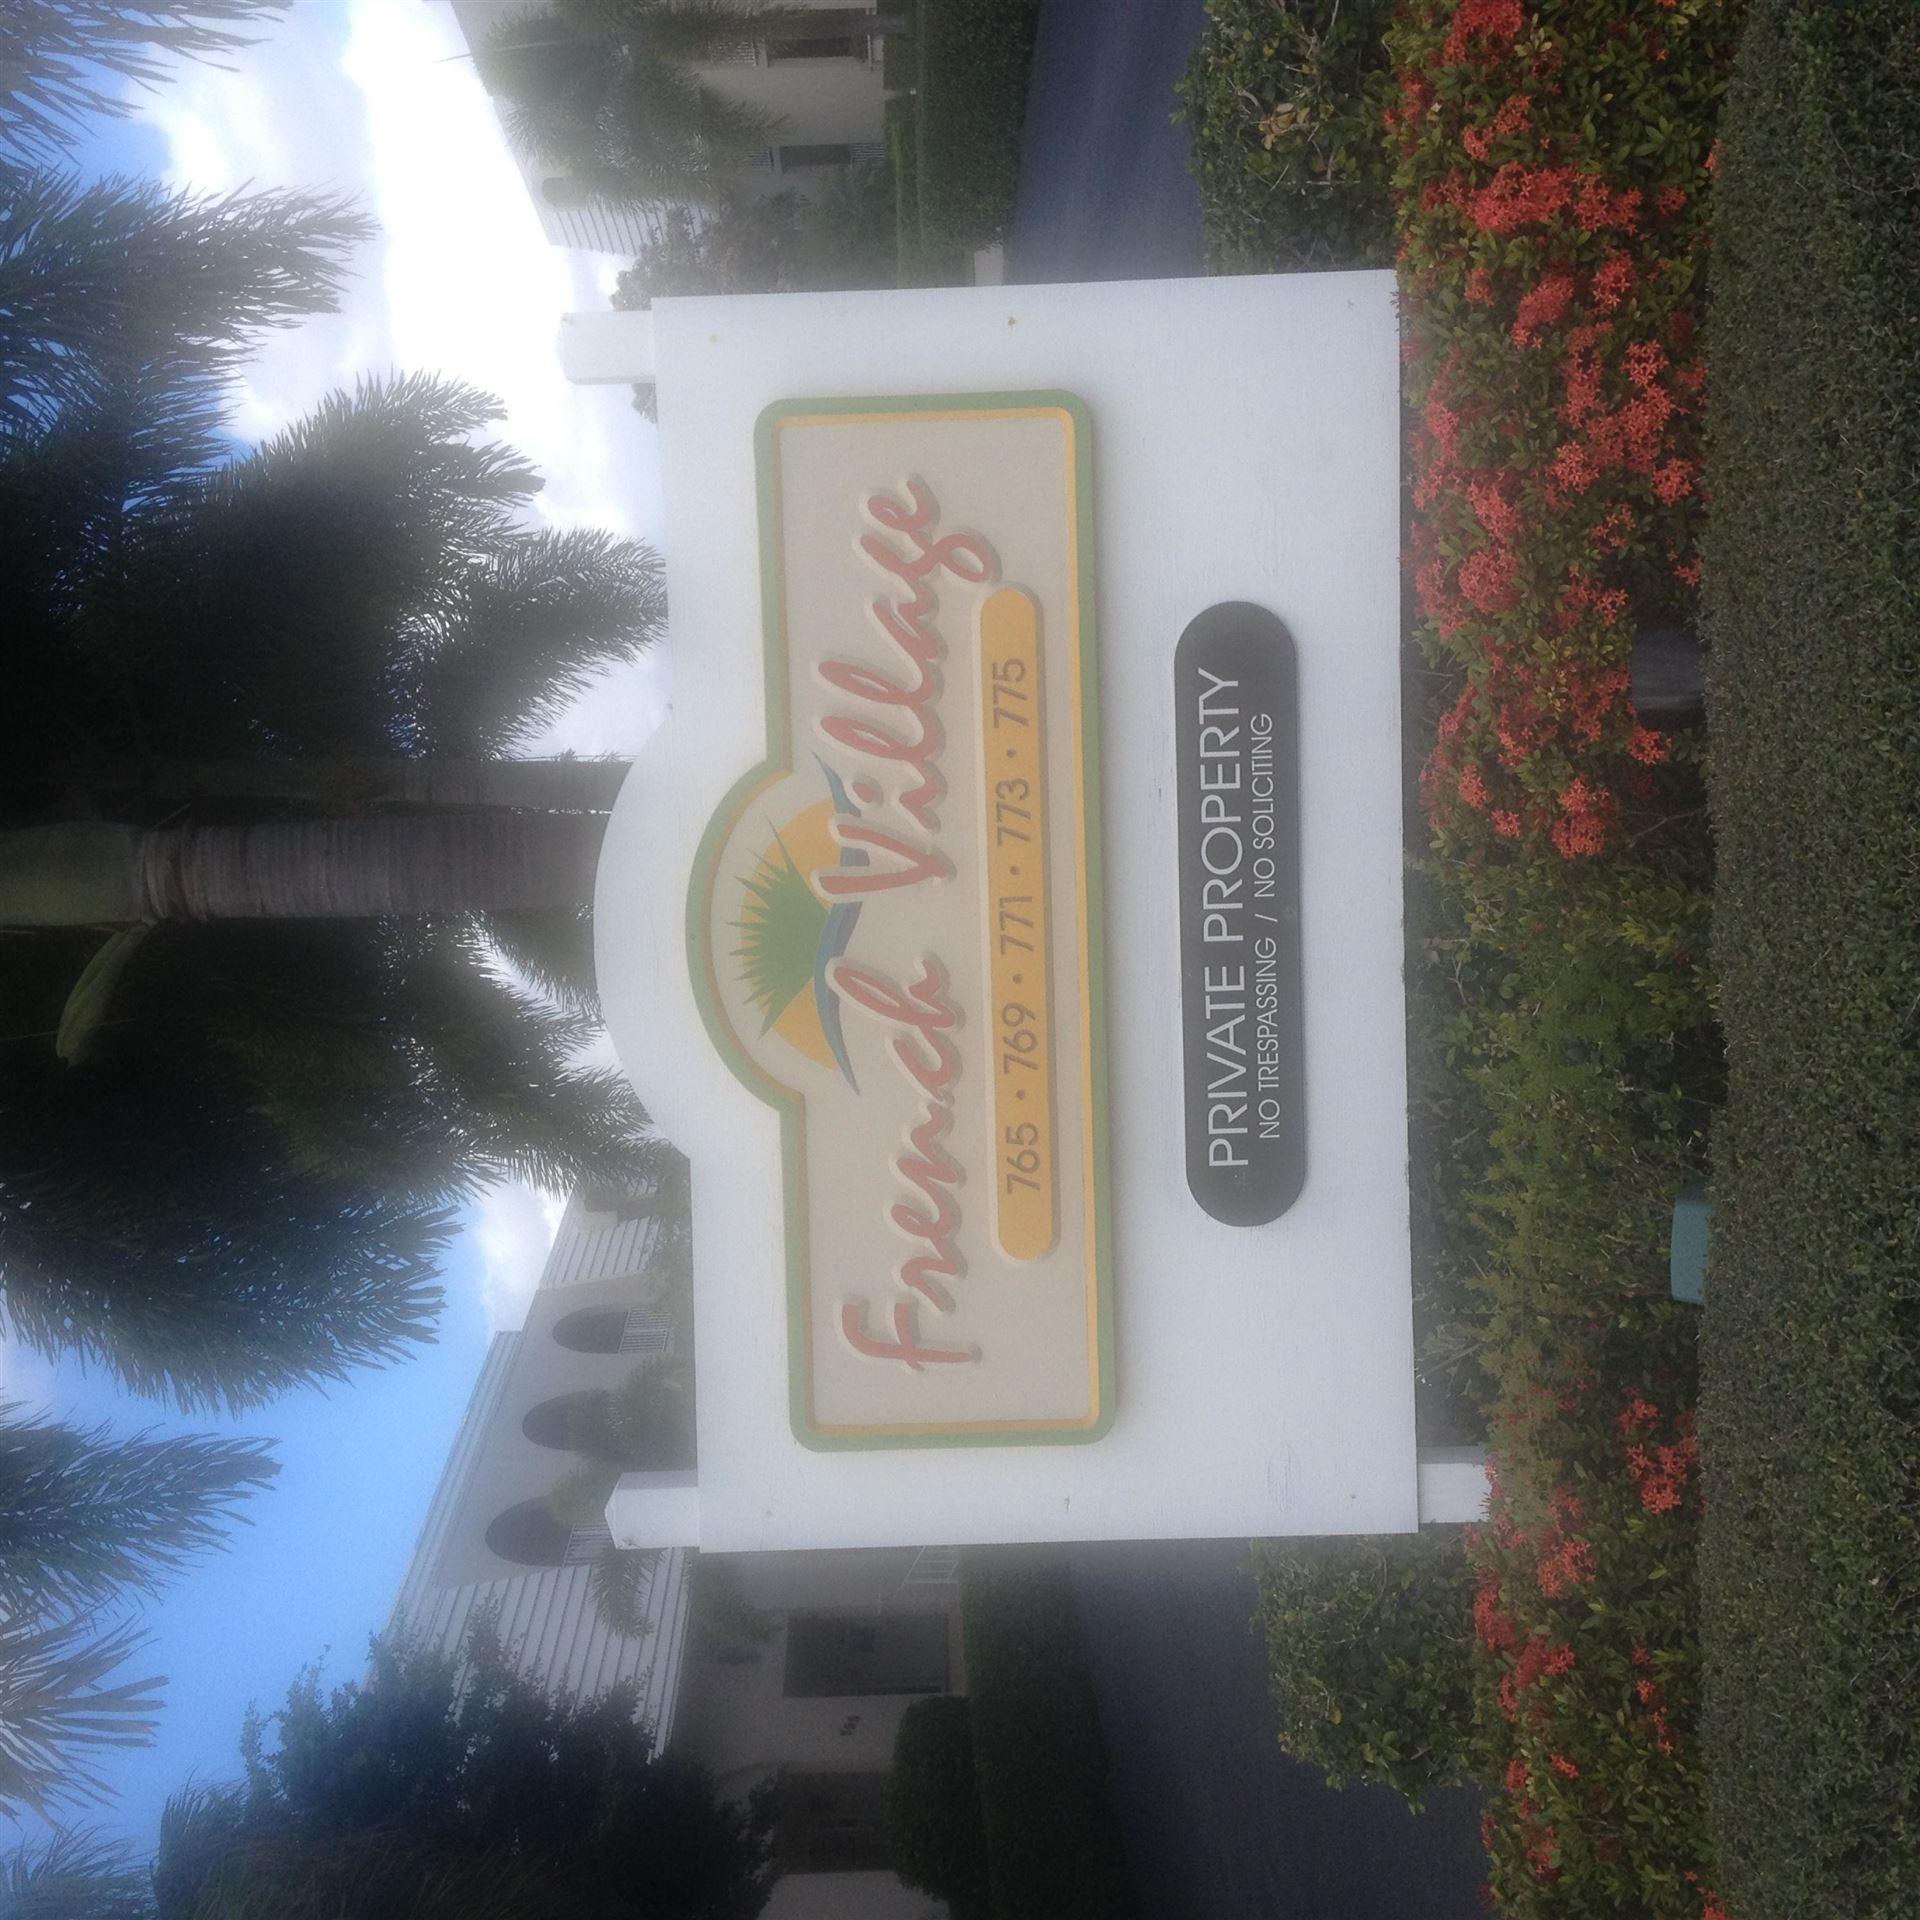 771 Jeffery Street #201, Boca Raton, FL 33487 - #: RX-10651627